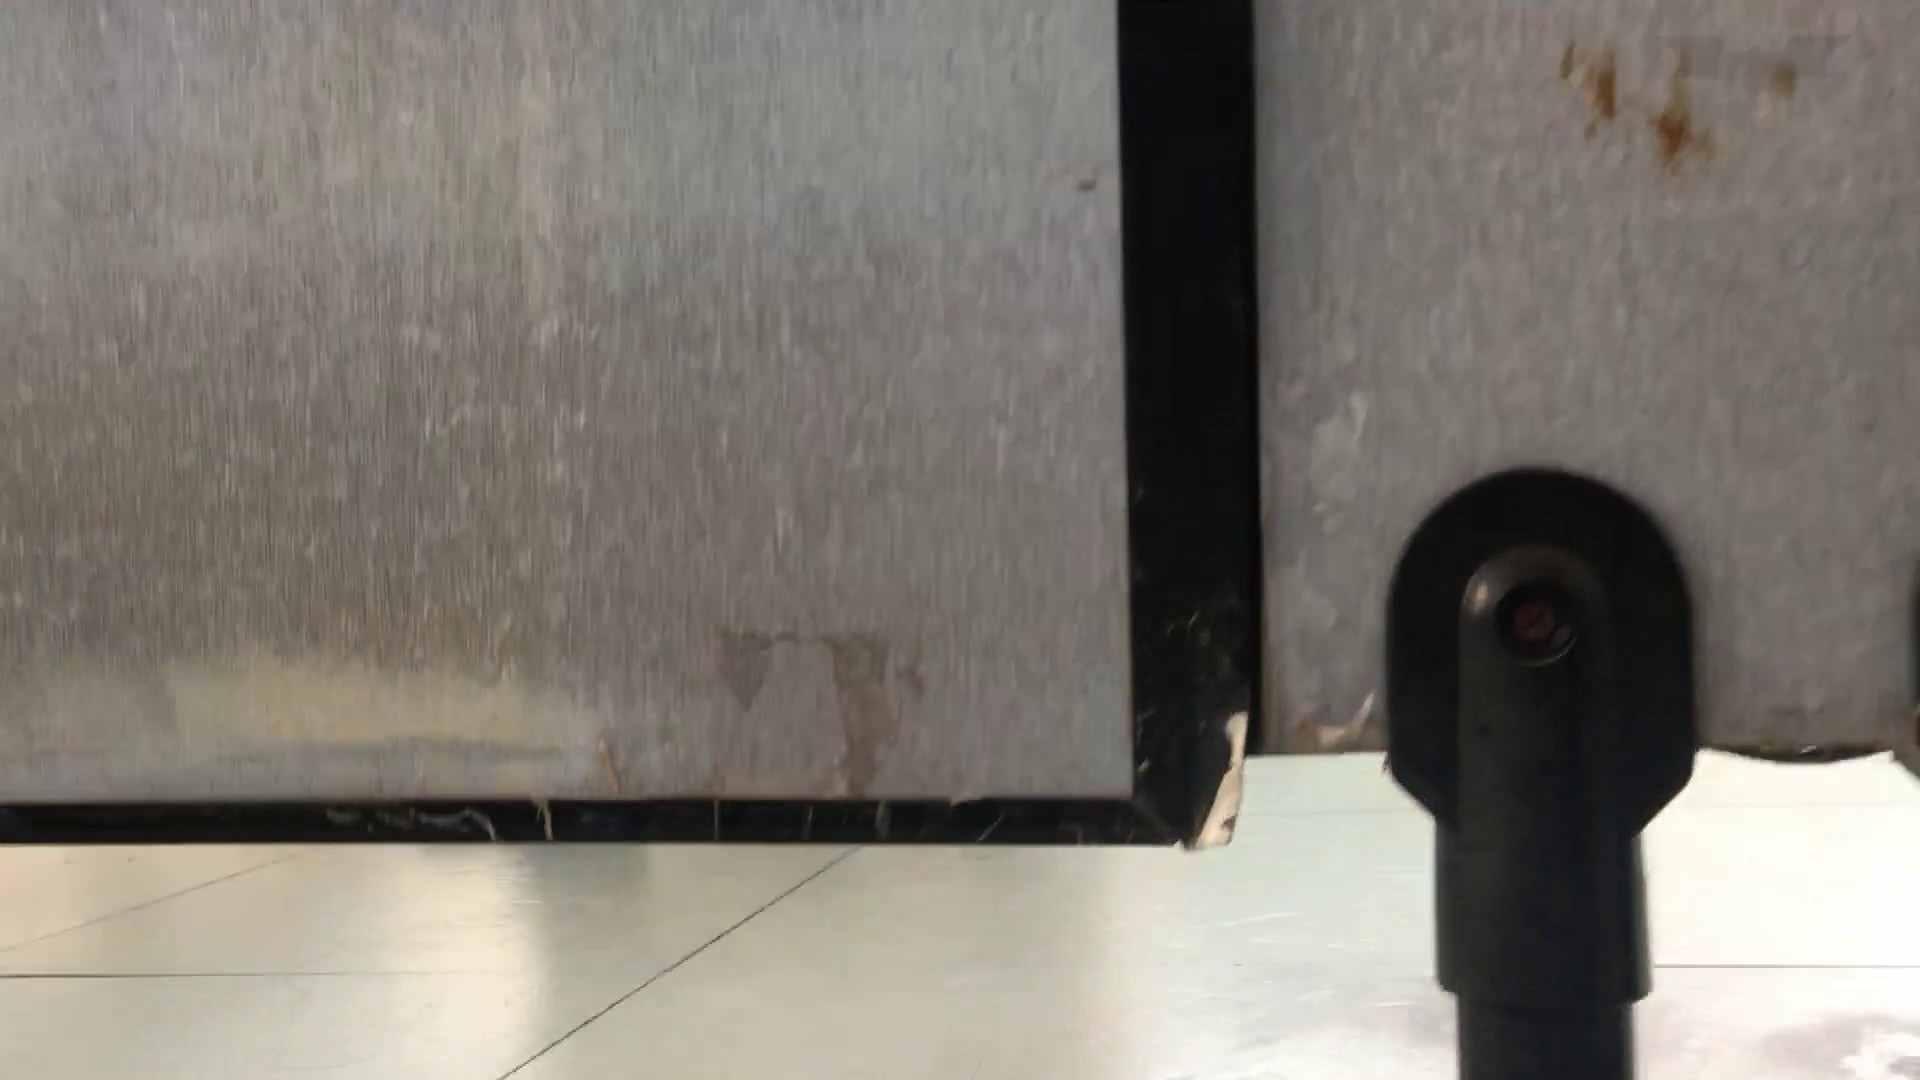 芸術大学ガチ潜入盗撮 JD盗撮 美女の洗面所の秘密 Vol.93 高評価 エロ画像 62画像 9